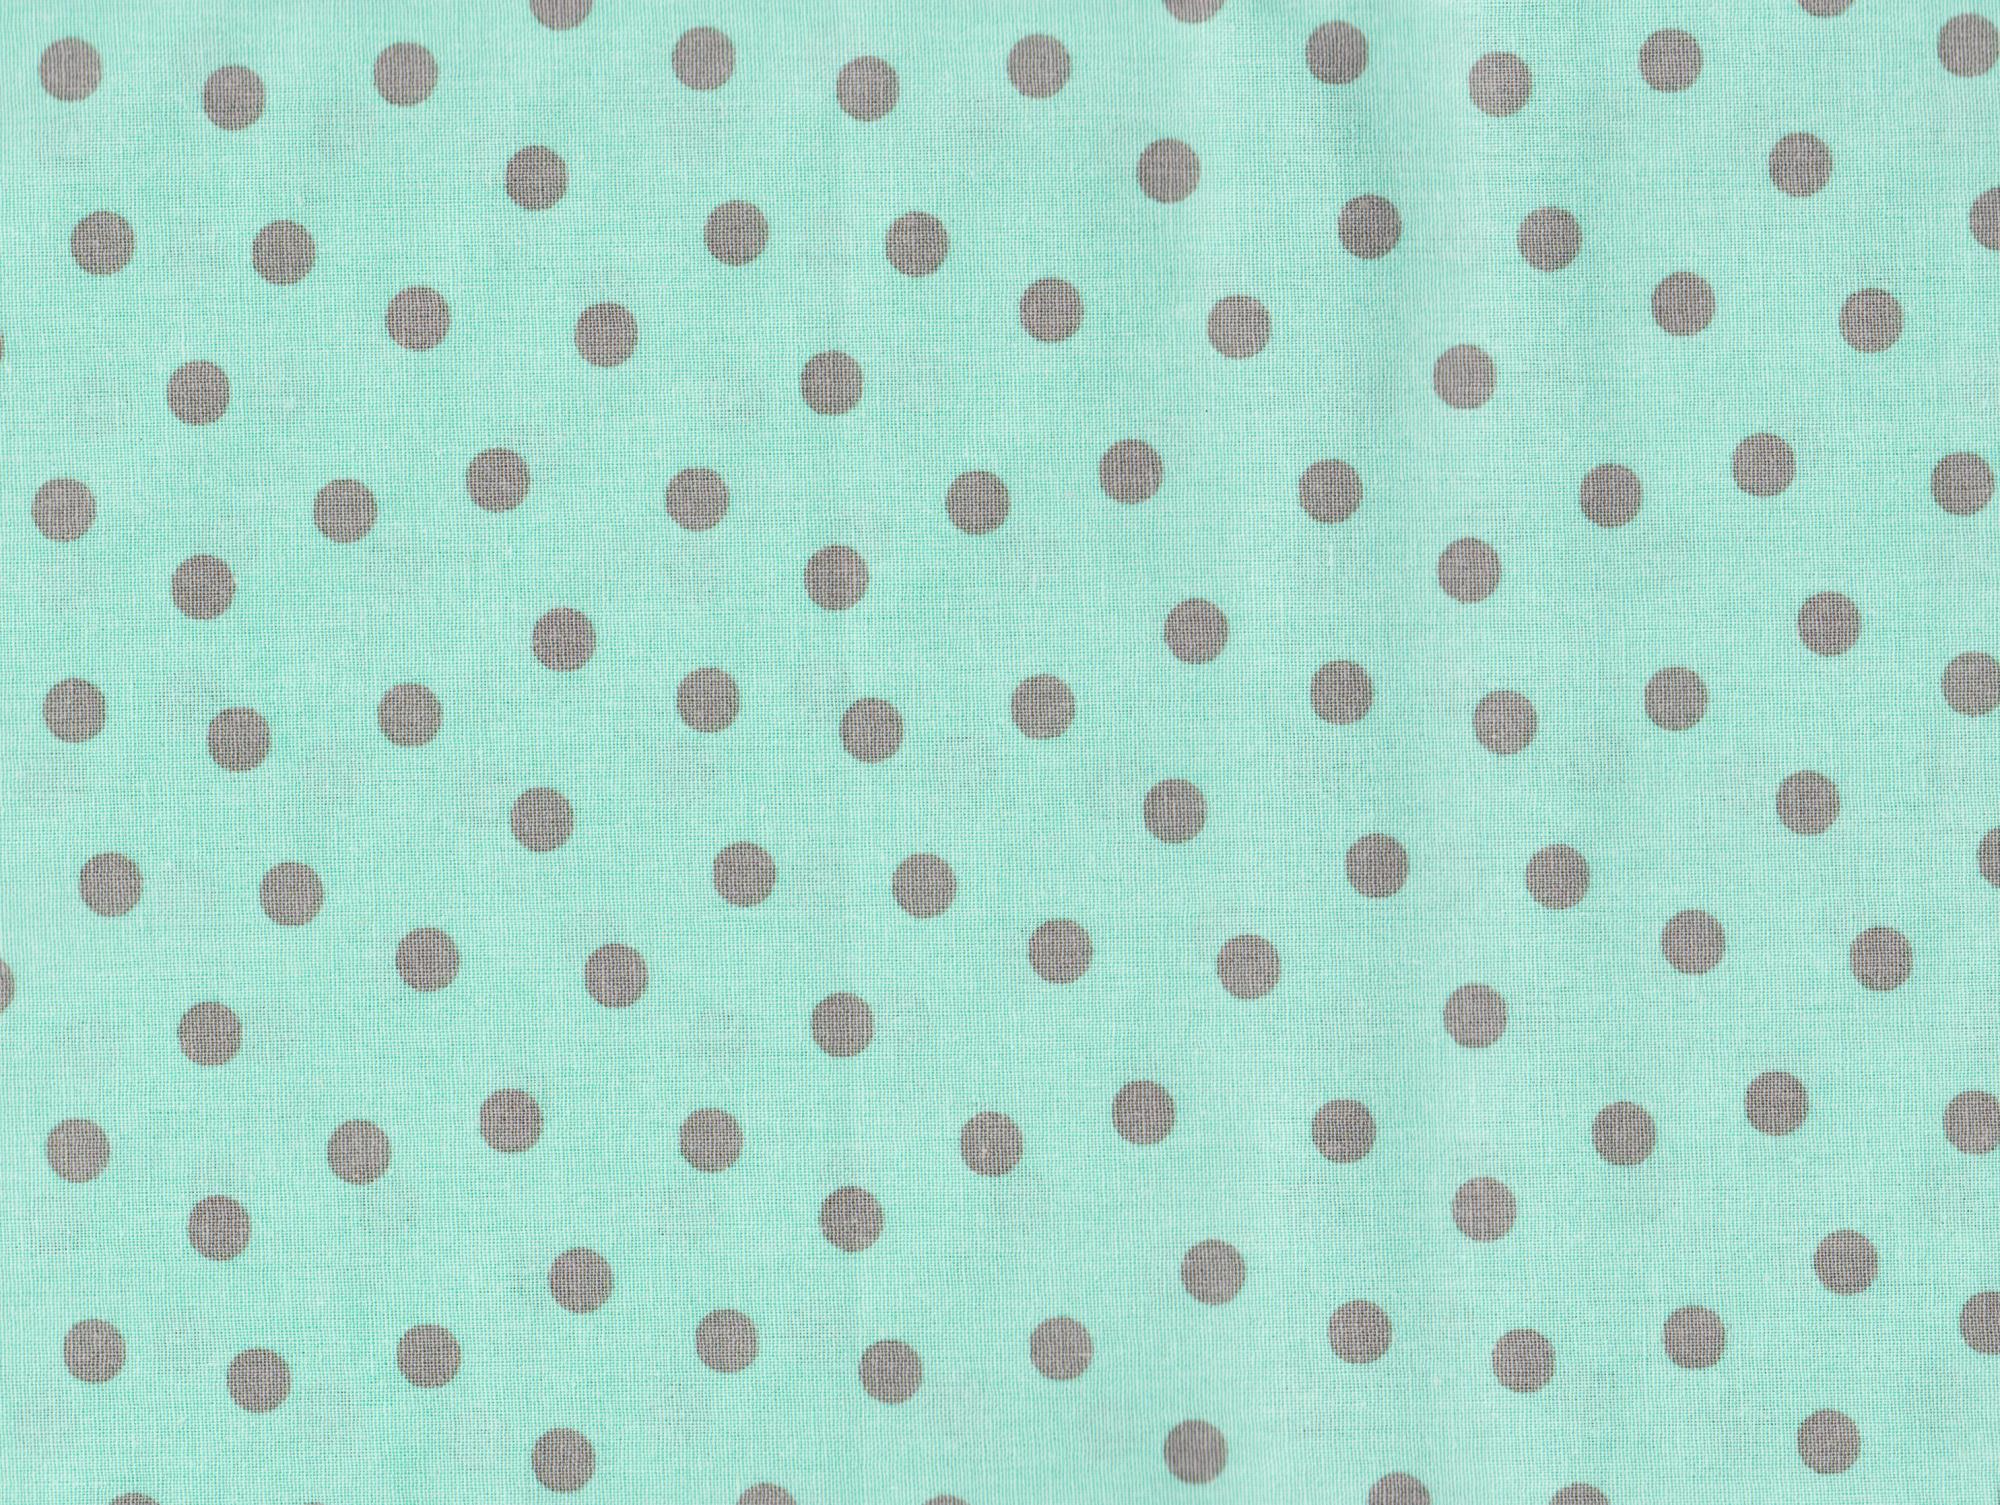 PROMO* CF-Mint Condition 4141108WM-03 Mint - Polka Dot